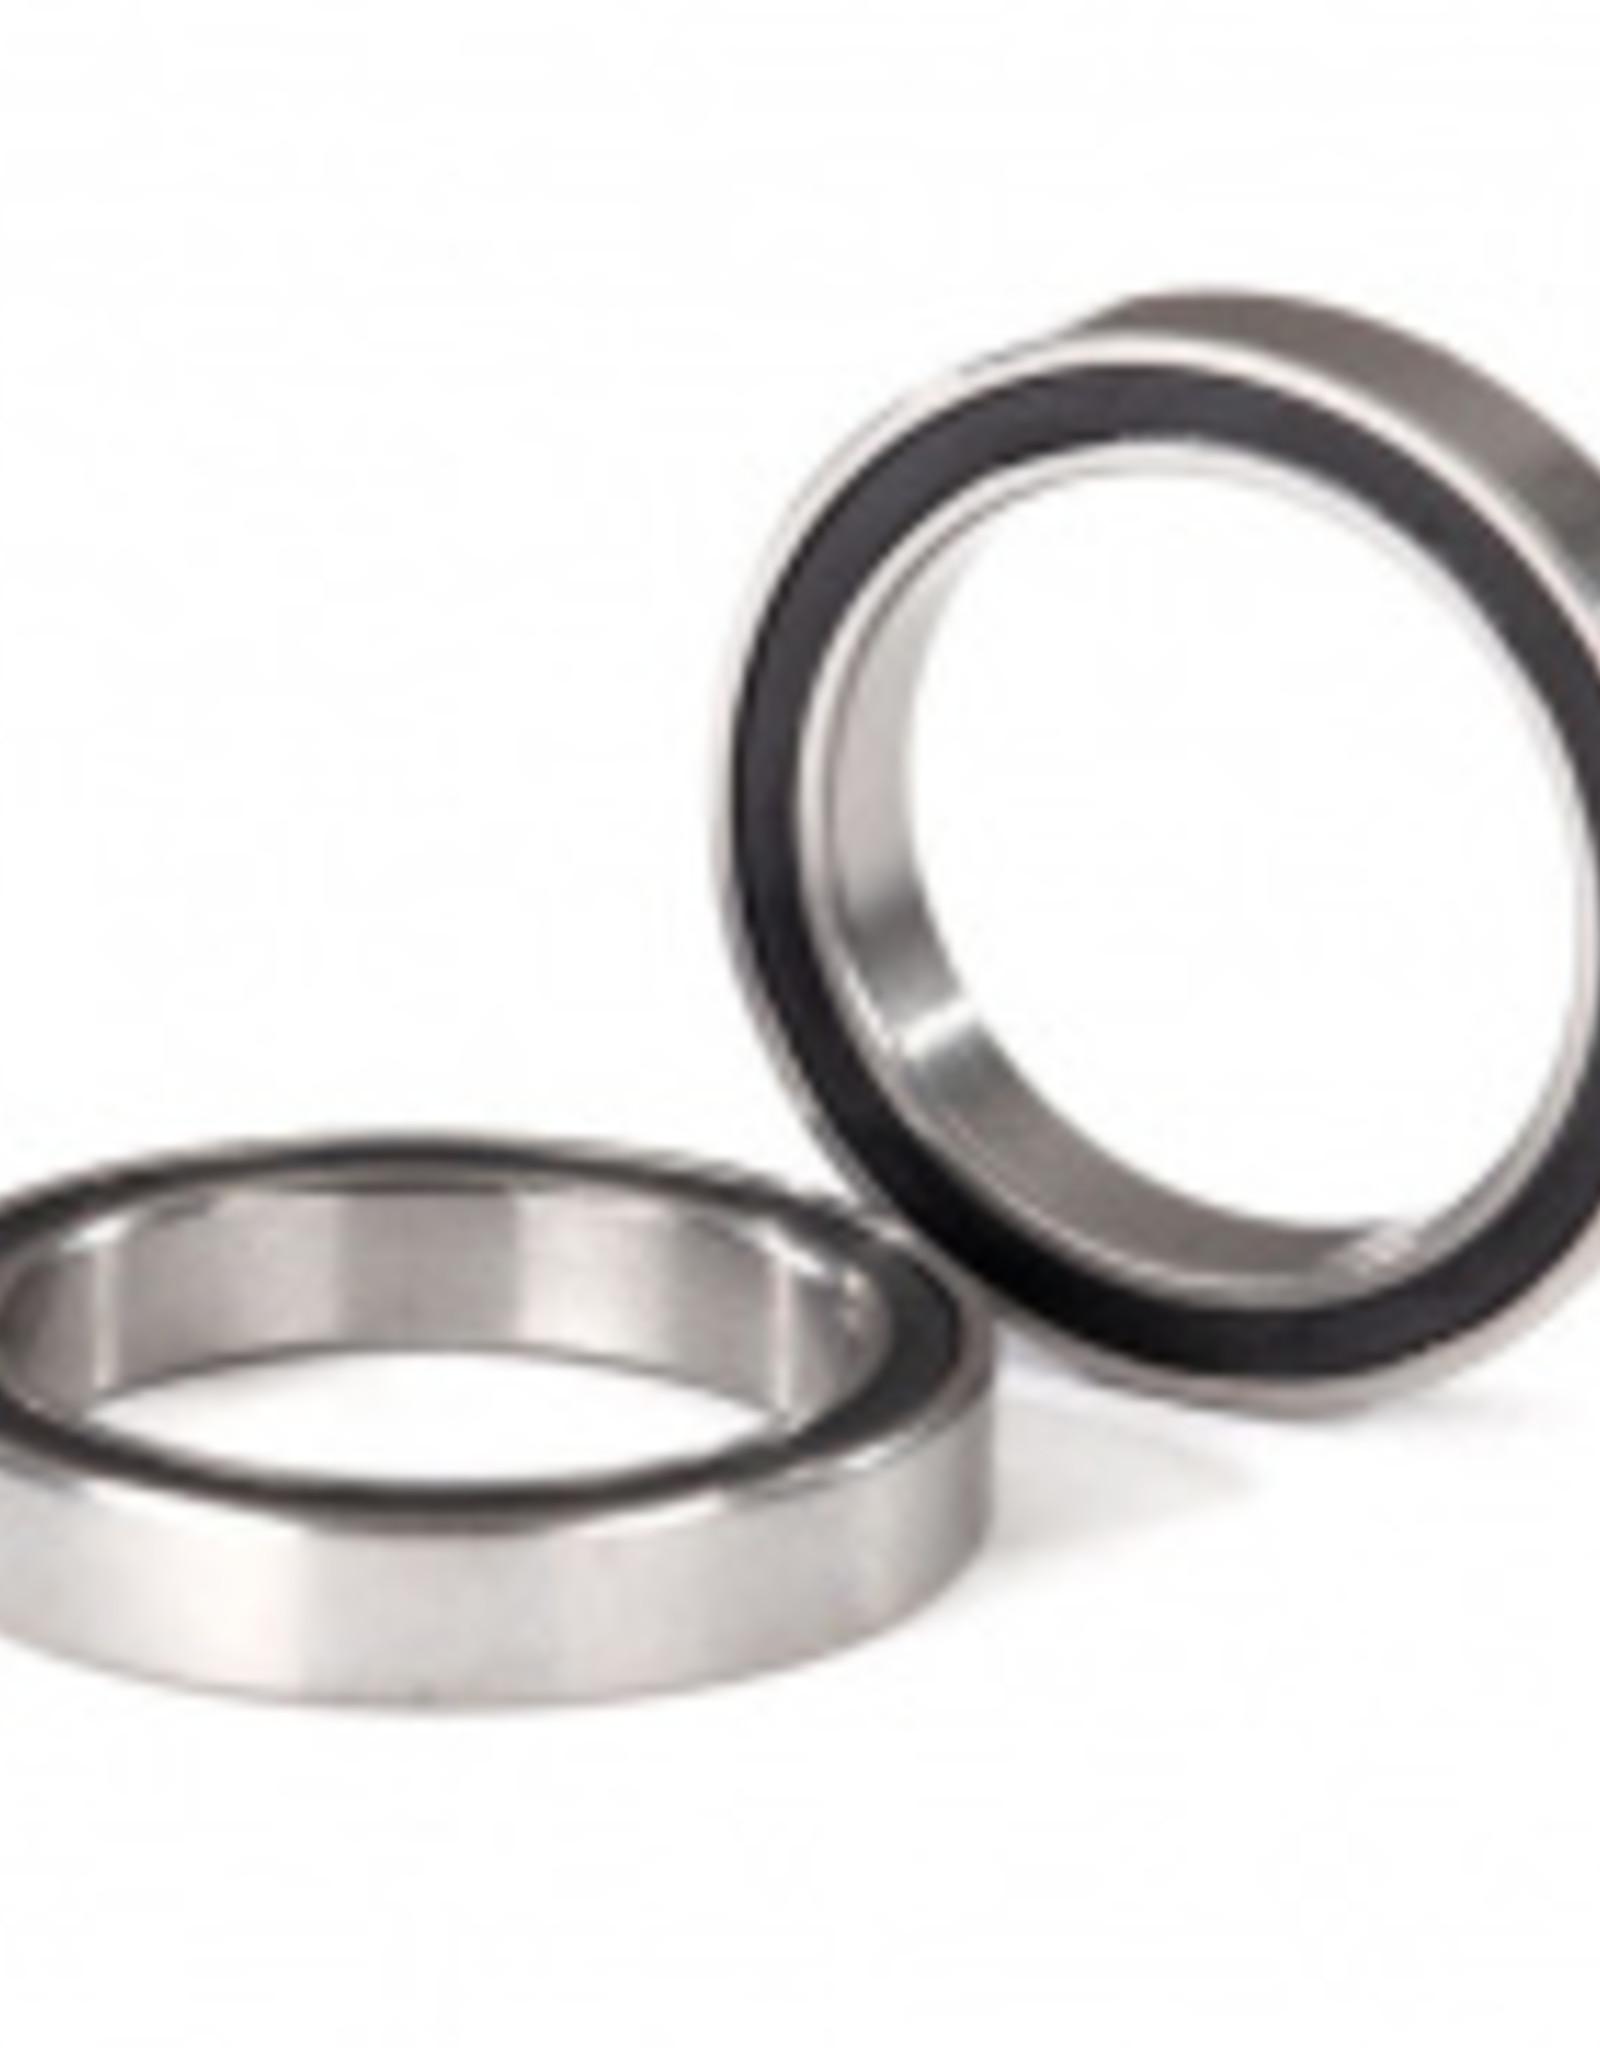 Traxxas Traxxas X-Maxx Ball bearings, black rubber sealed (17x23x4mm) (2)